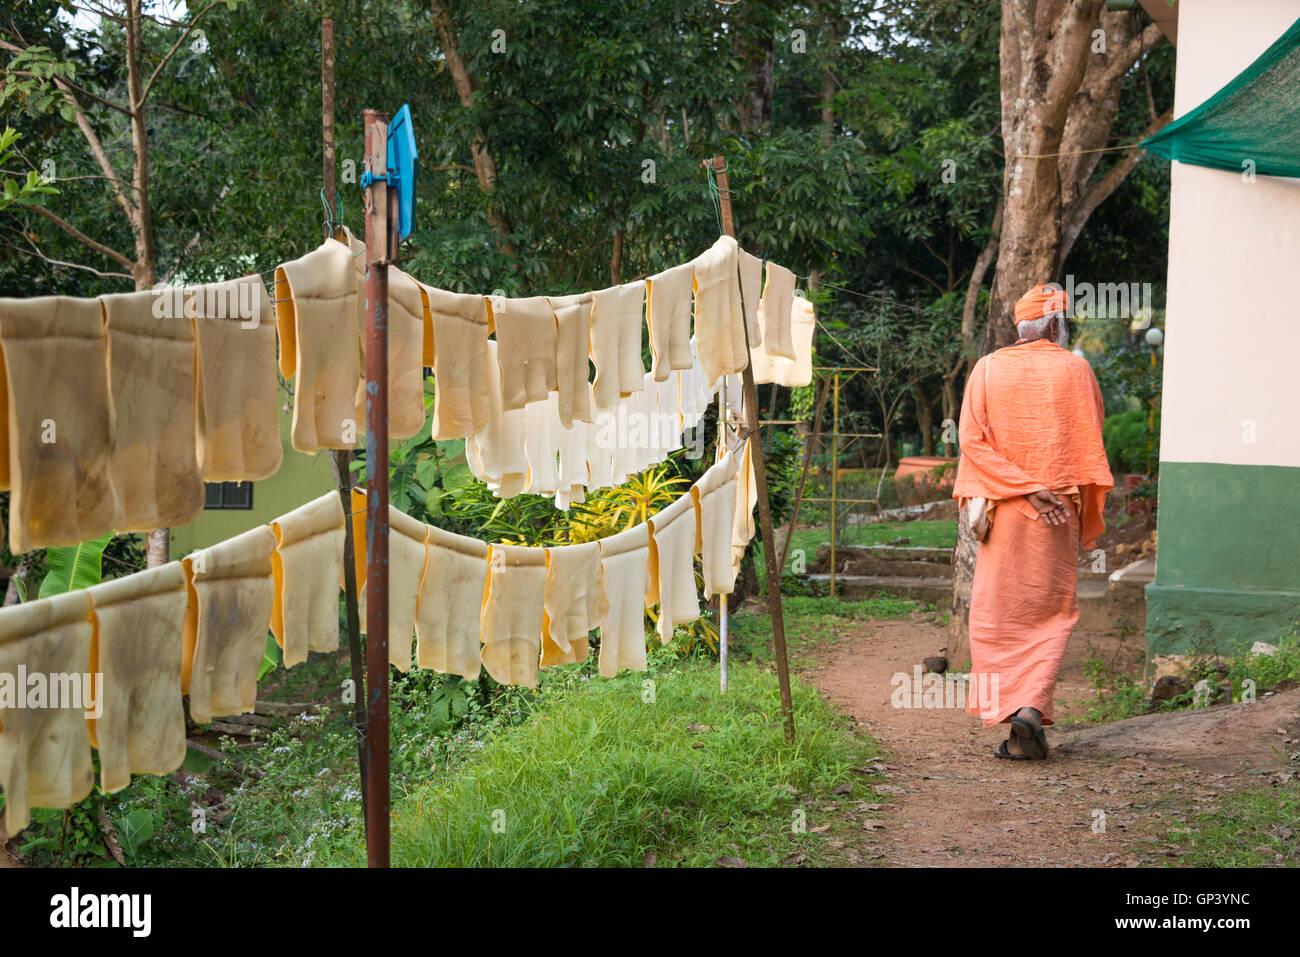 Rubber tapping at Sivananda Yoga Vedanta Dhanwantari Ashram, Neyyardam, India Stock Photo